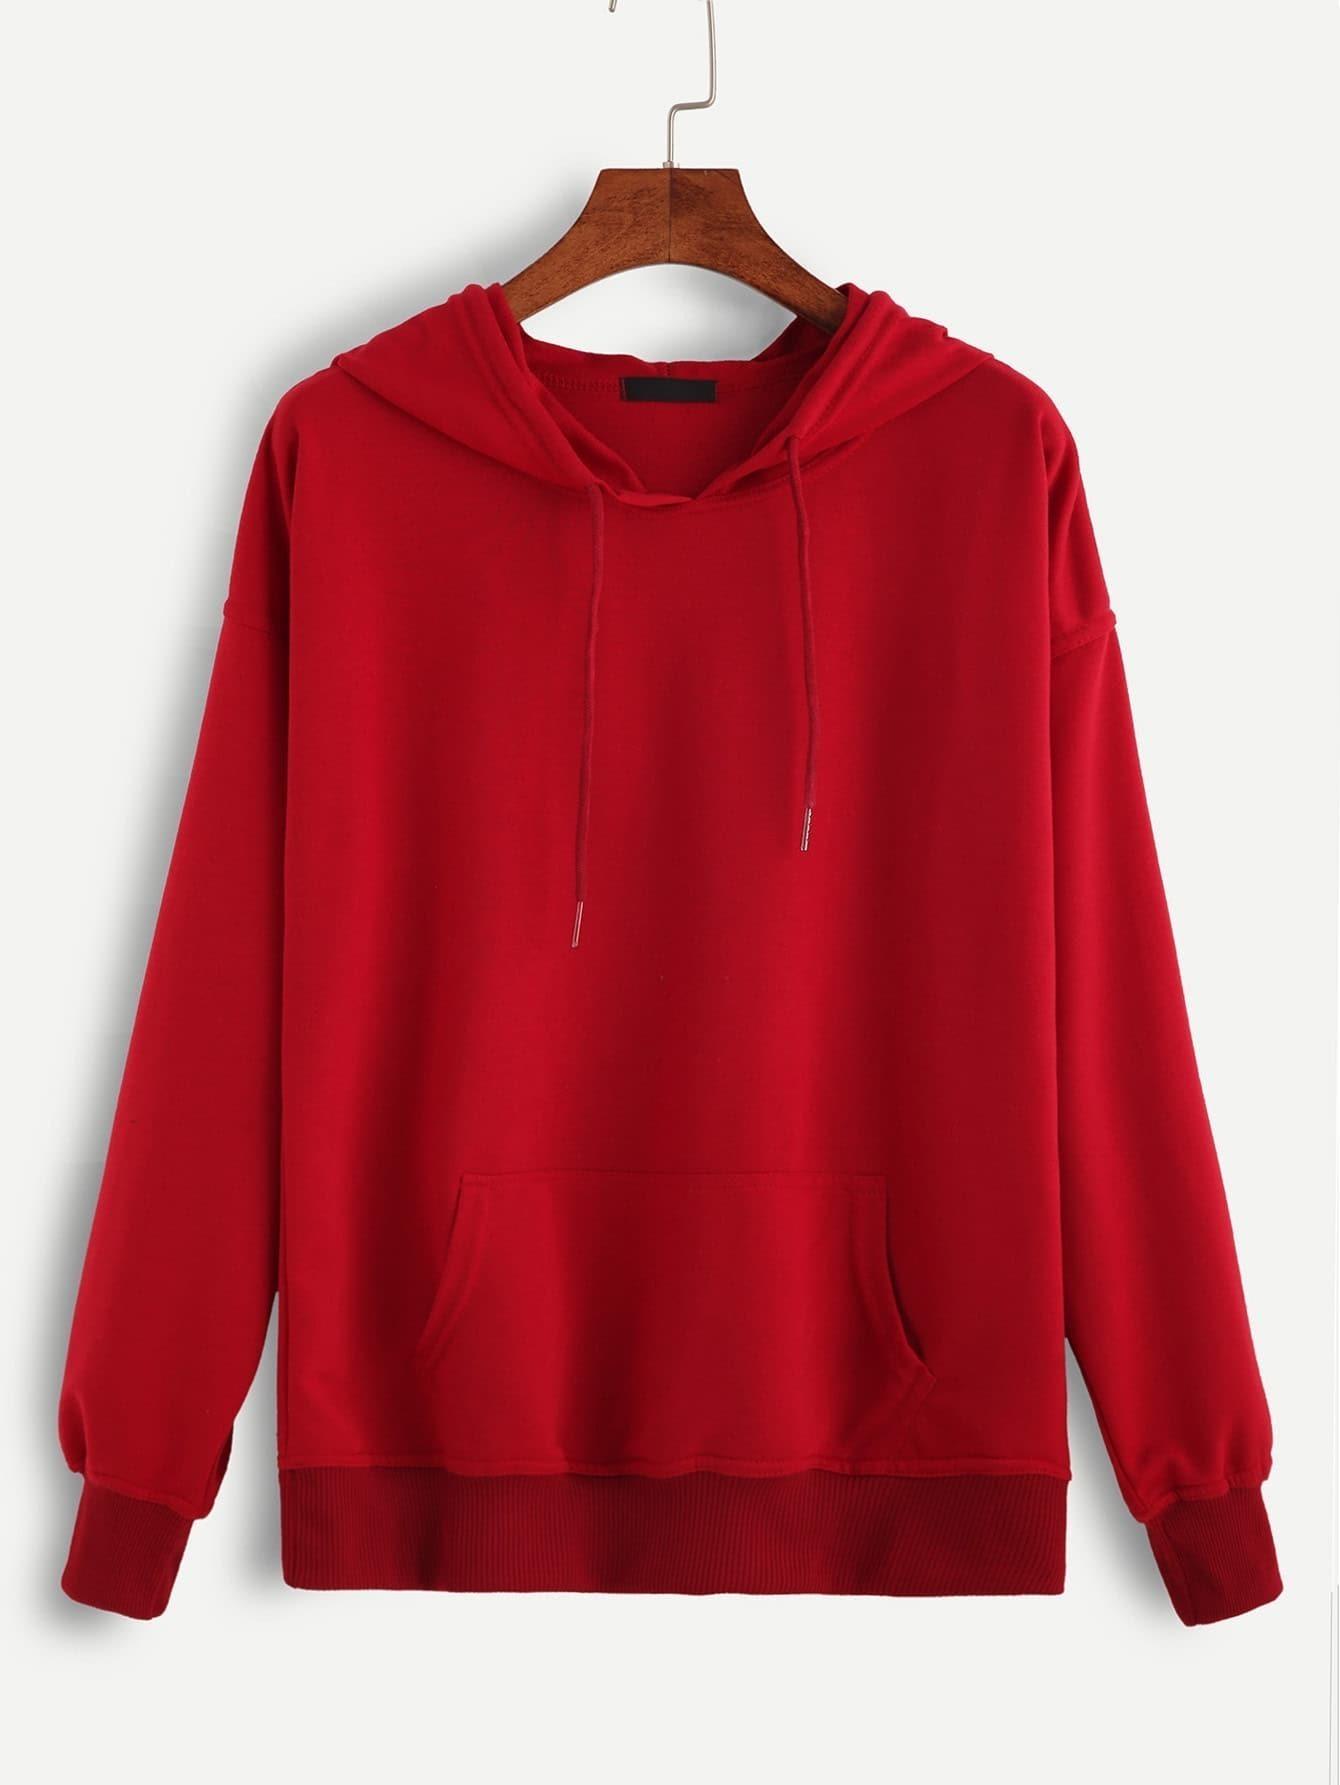 Red Hooded Drawstring Sweatshirt sweatshirt160930102